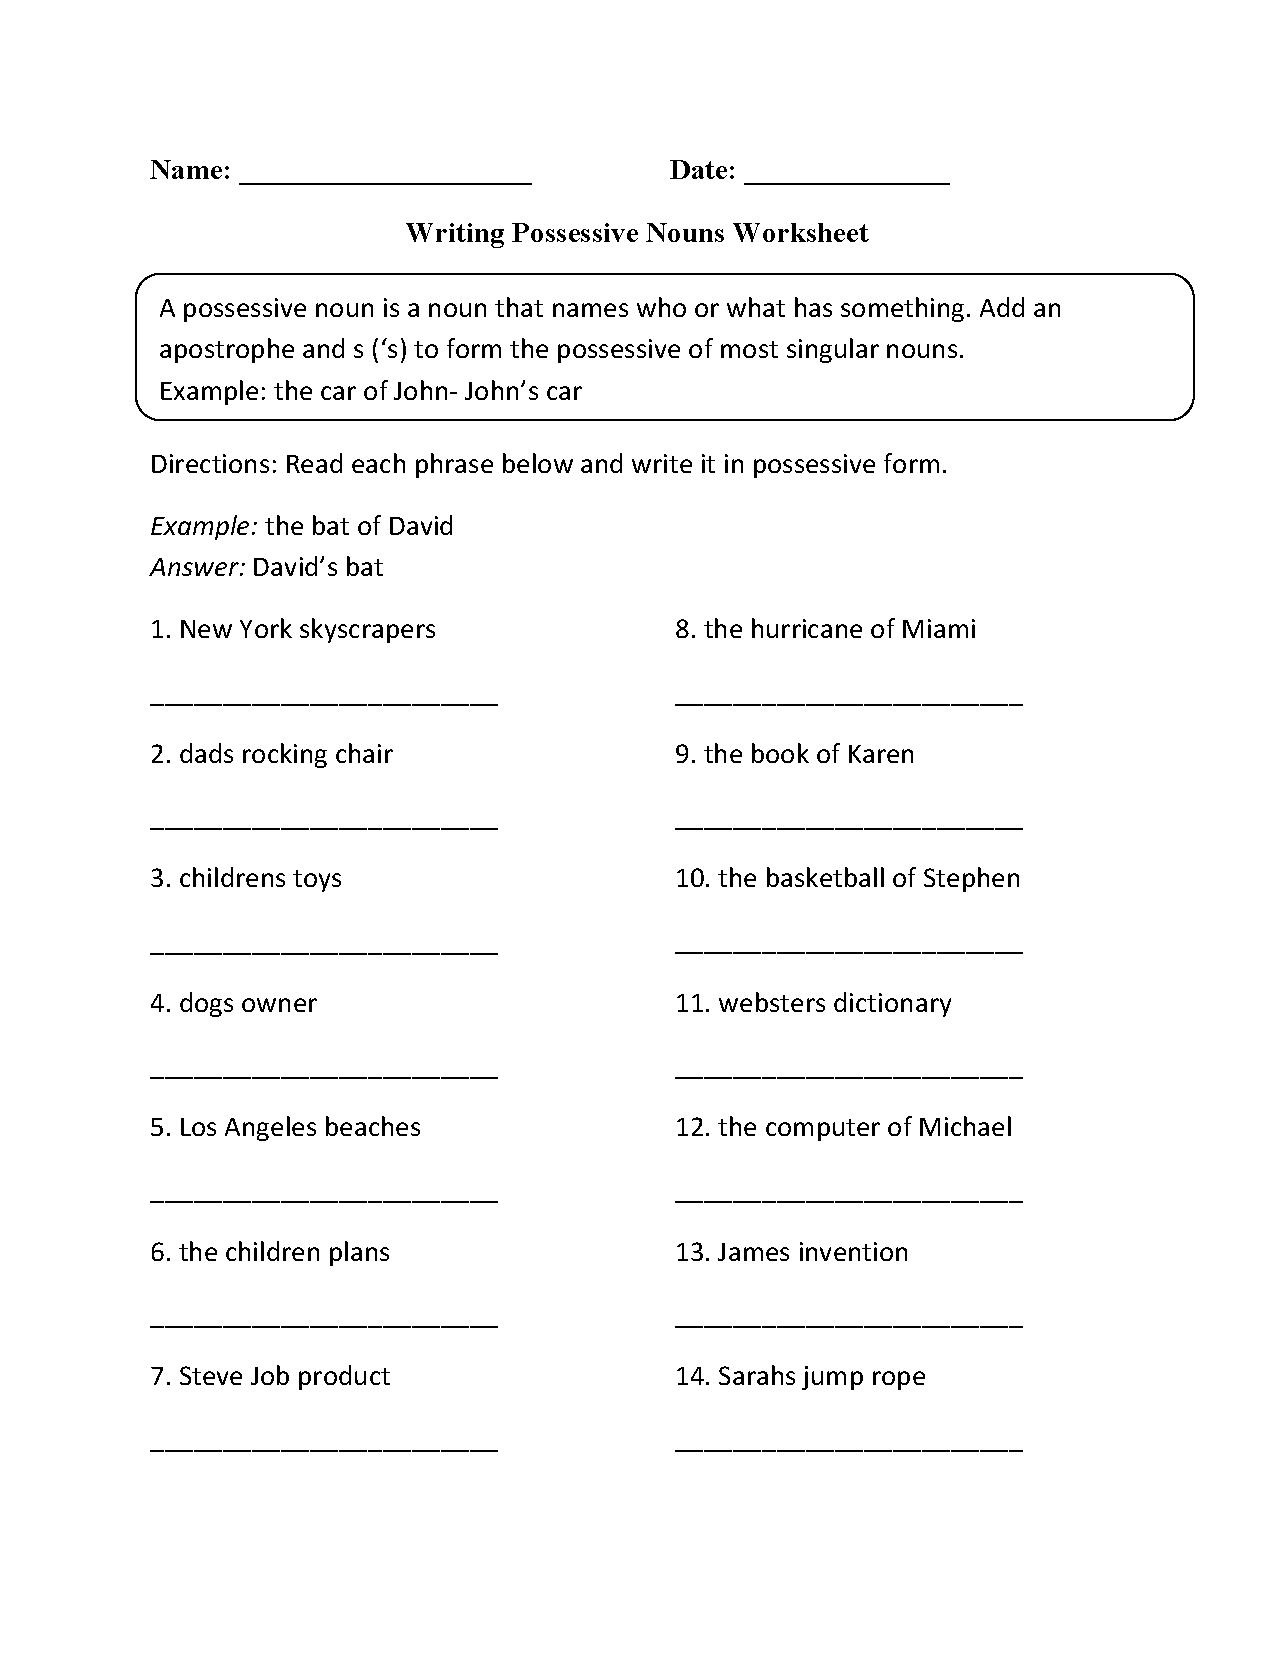 Reading Mastery Worksheet For Grade 1 Answer Key